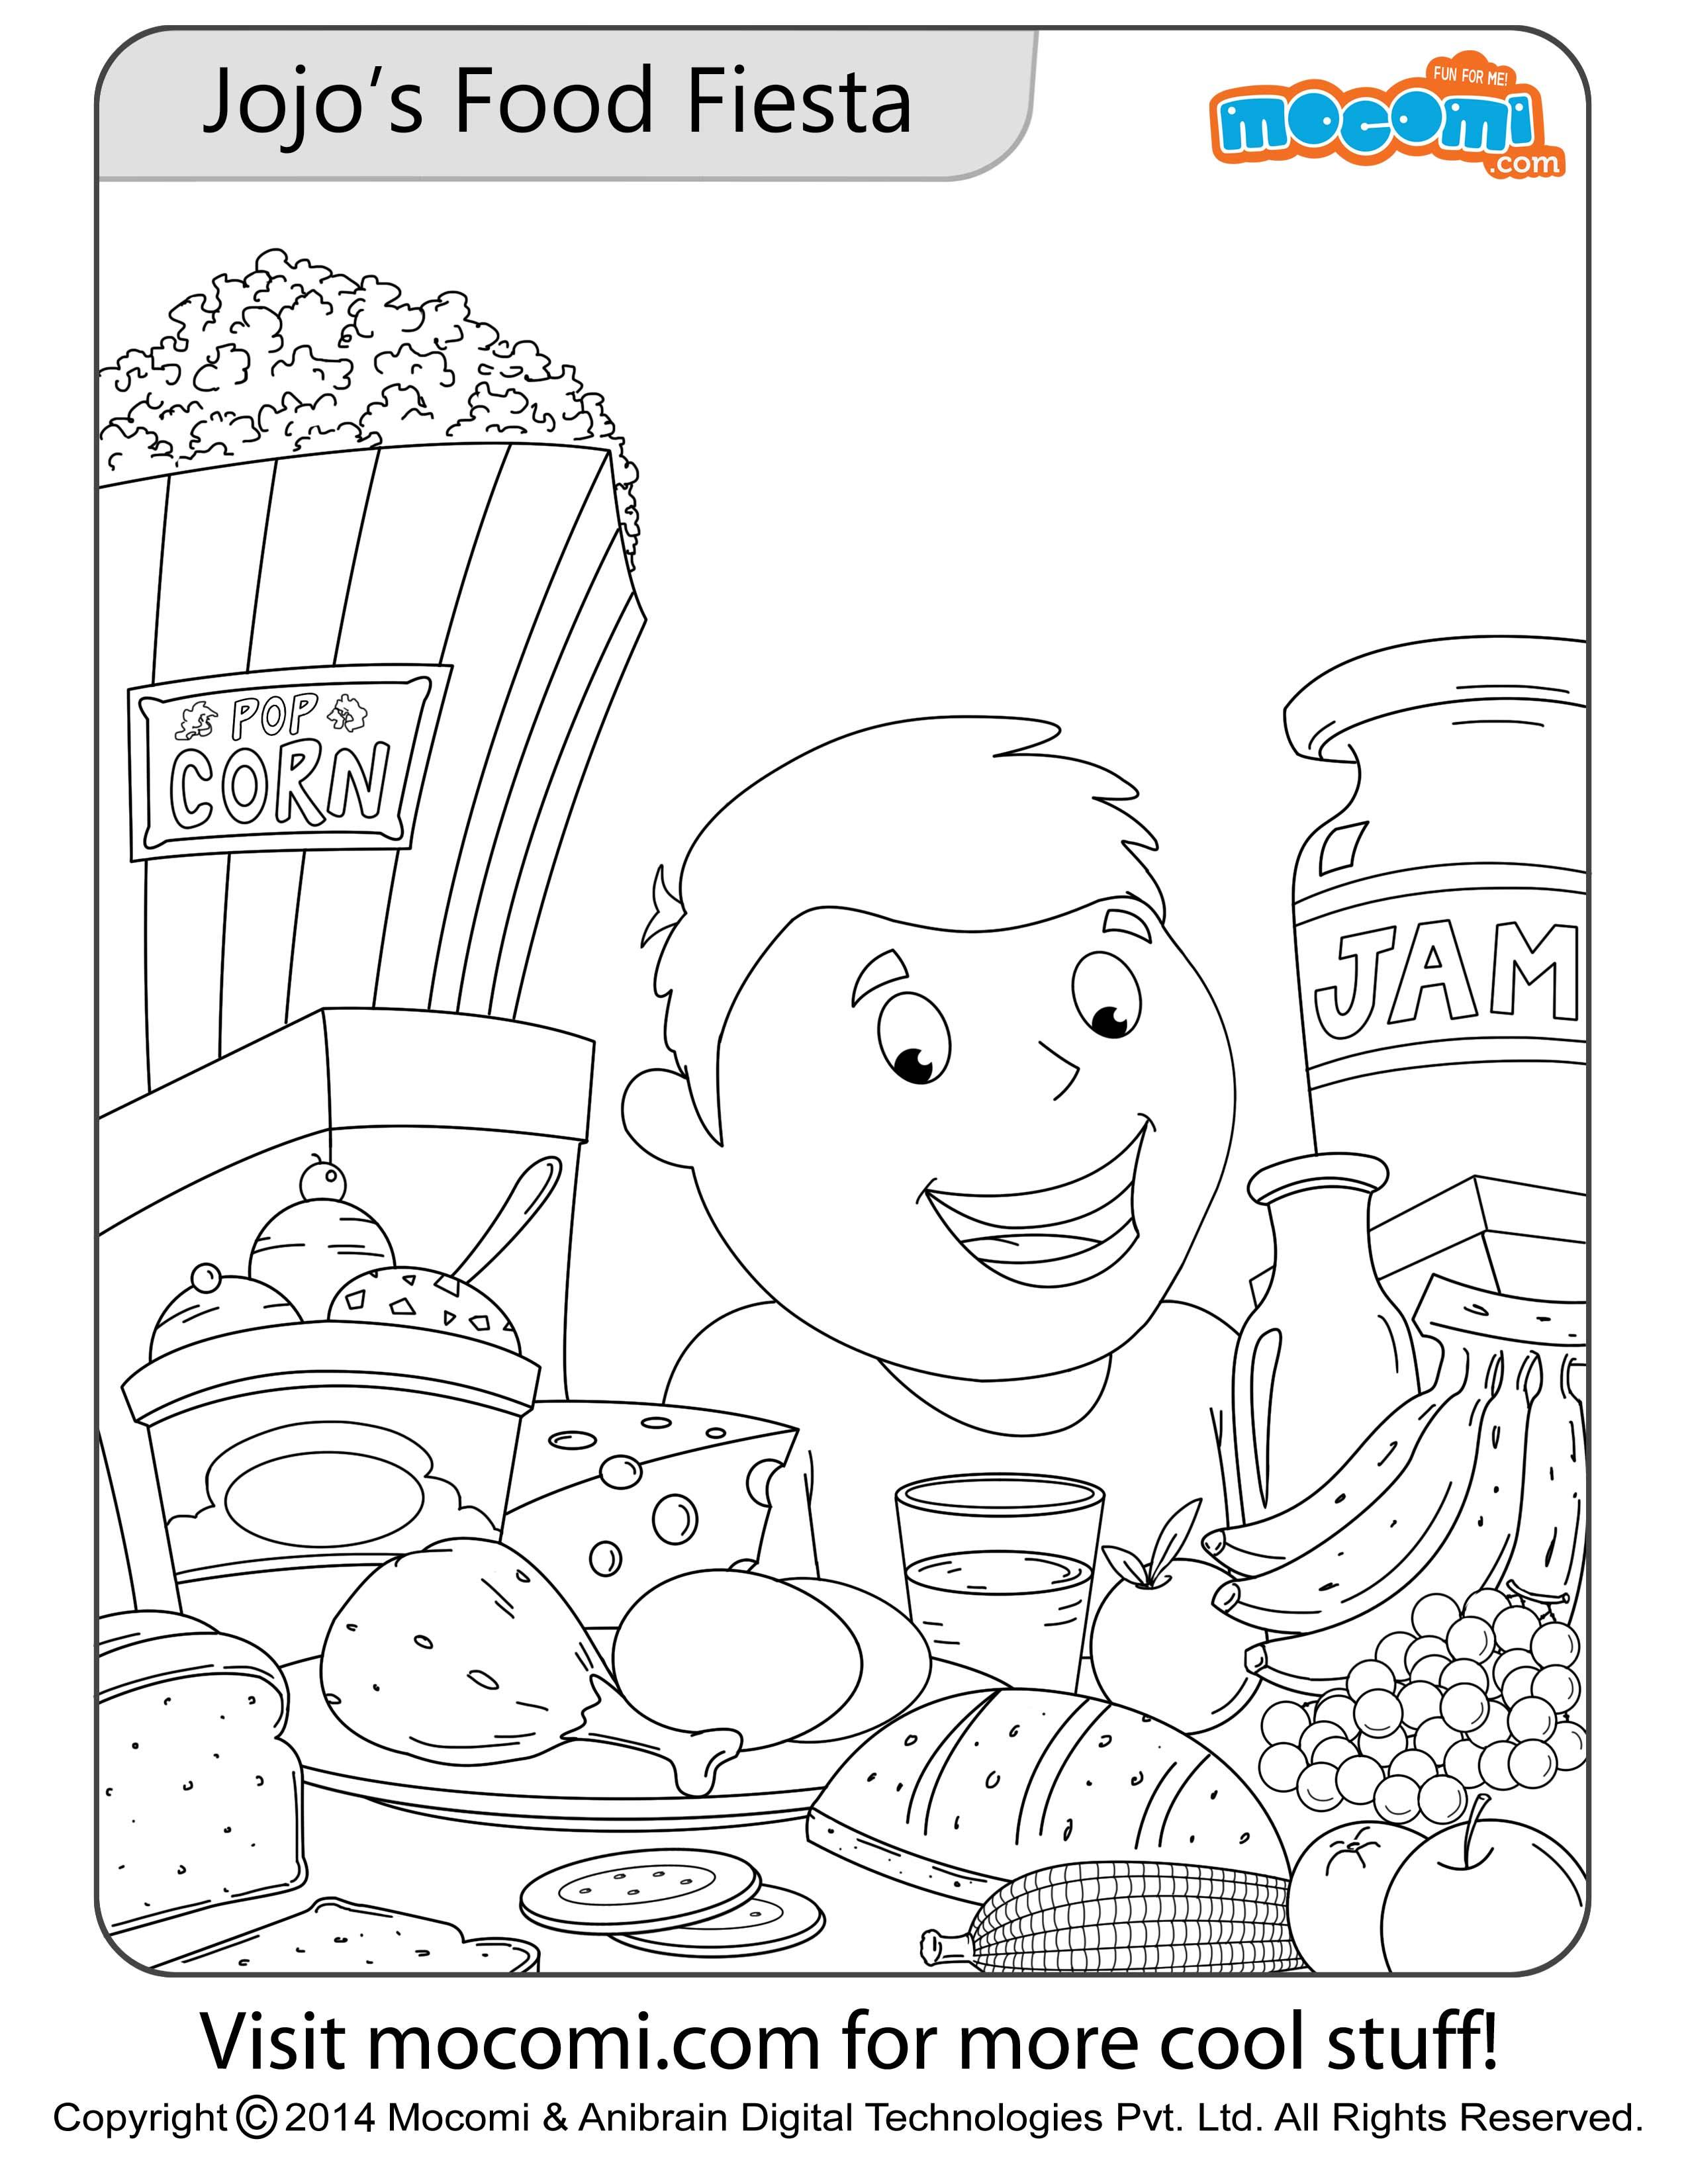 Jojo's Food Fiesta – Colouring Page